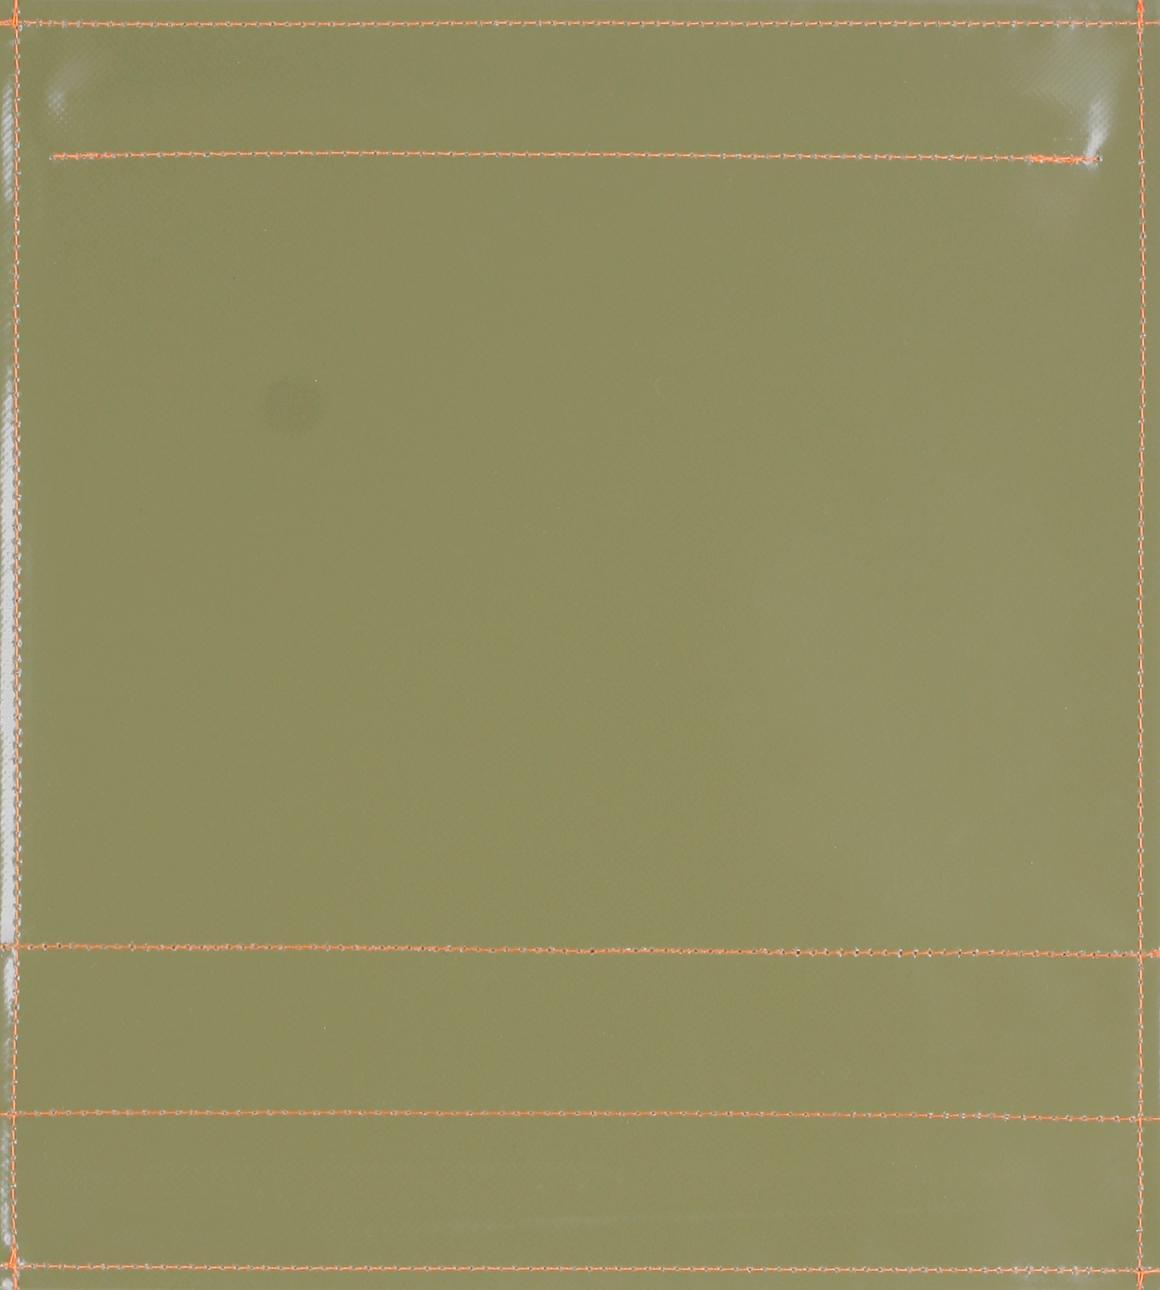 pur oliv (mittel)